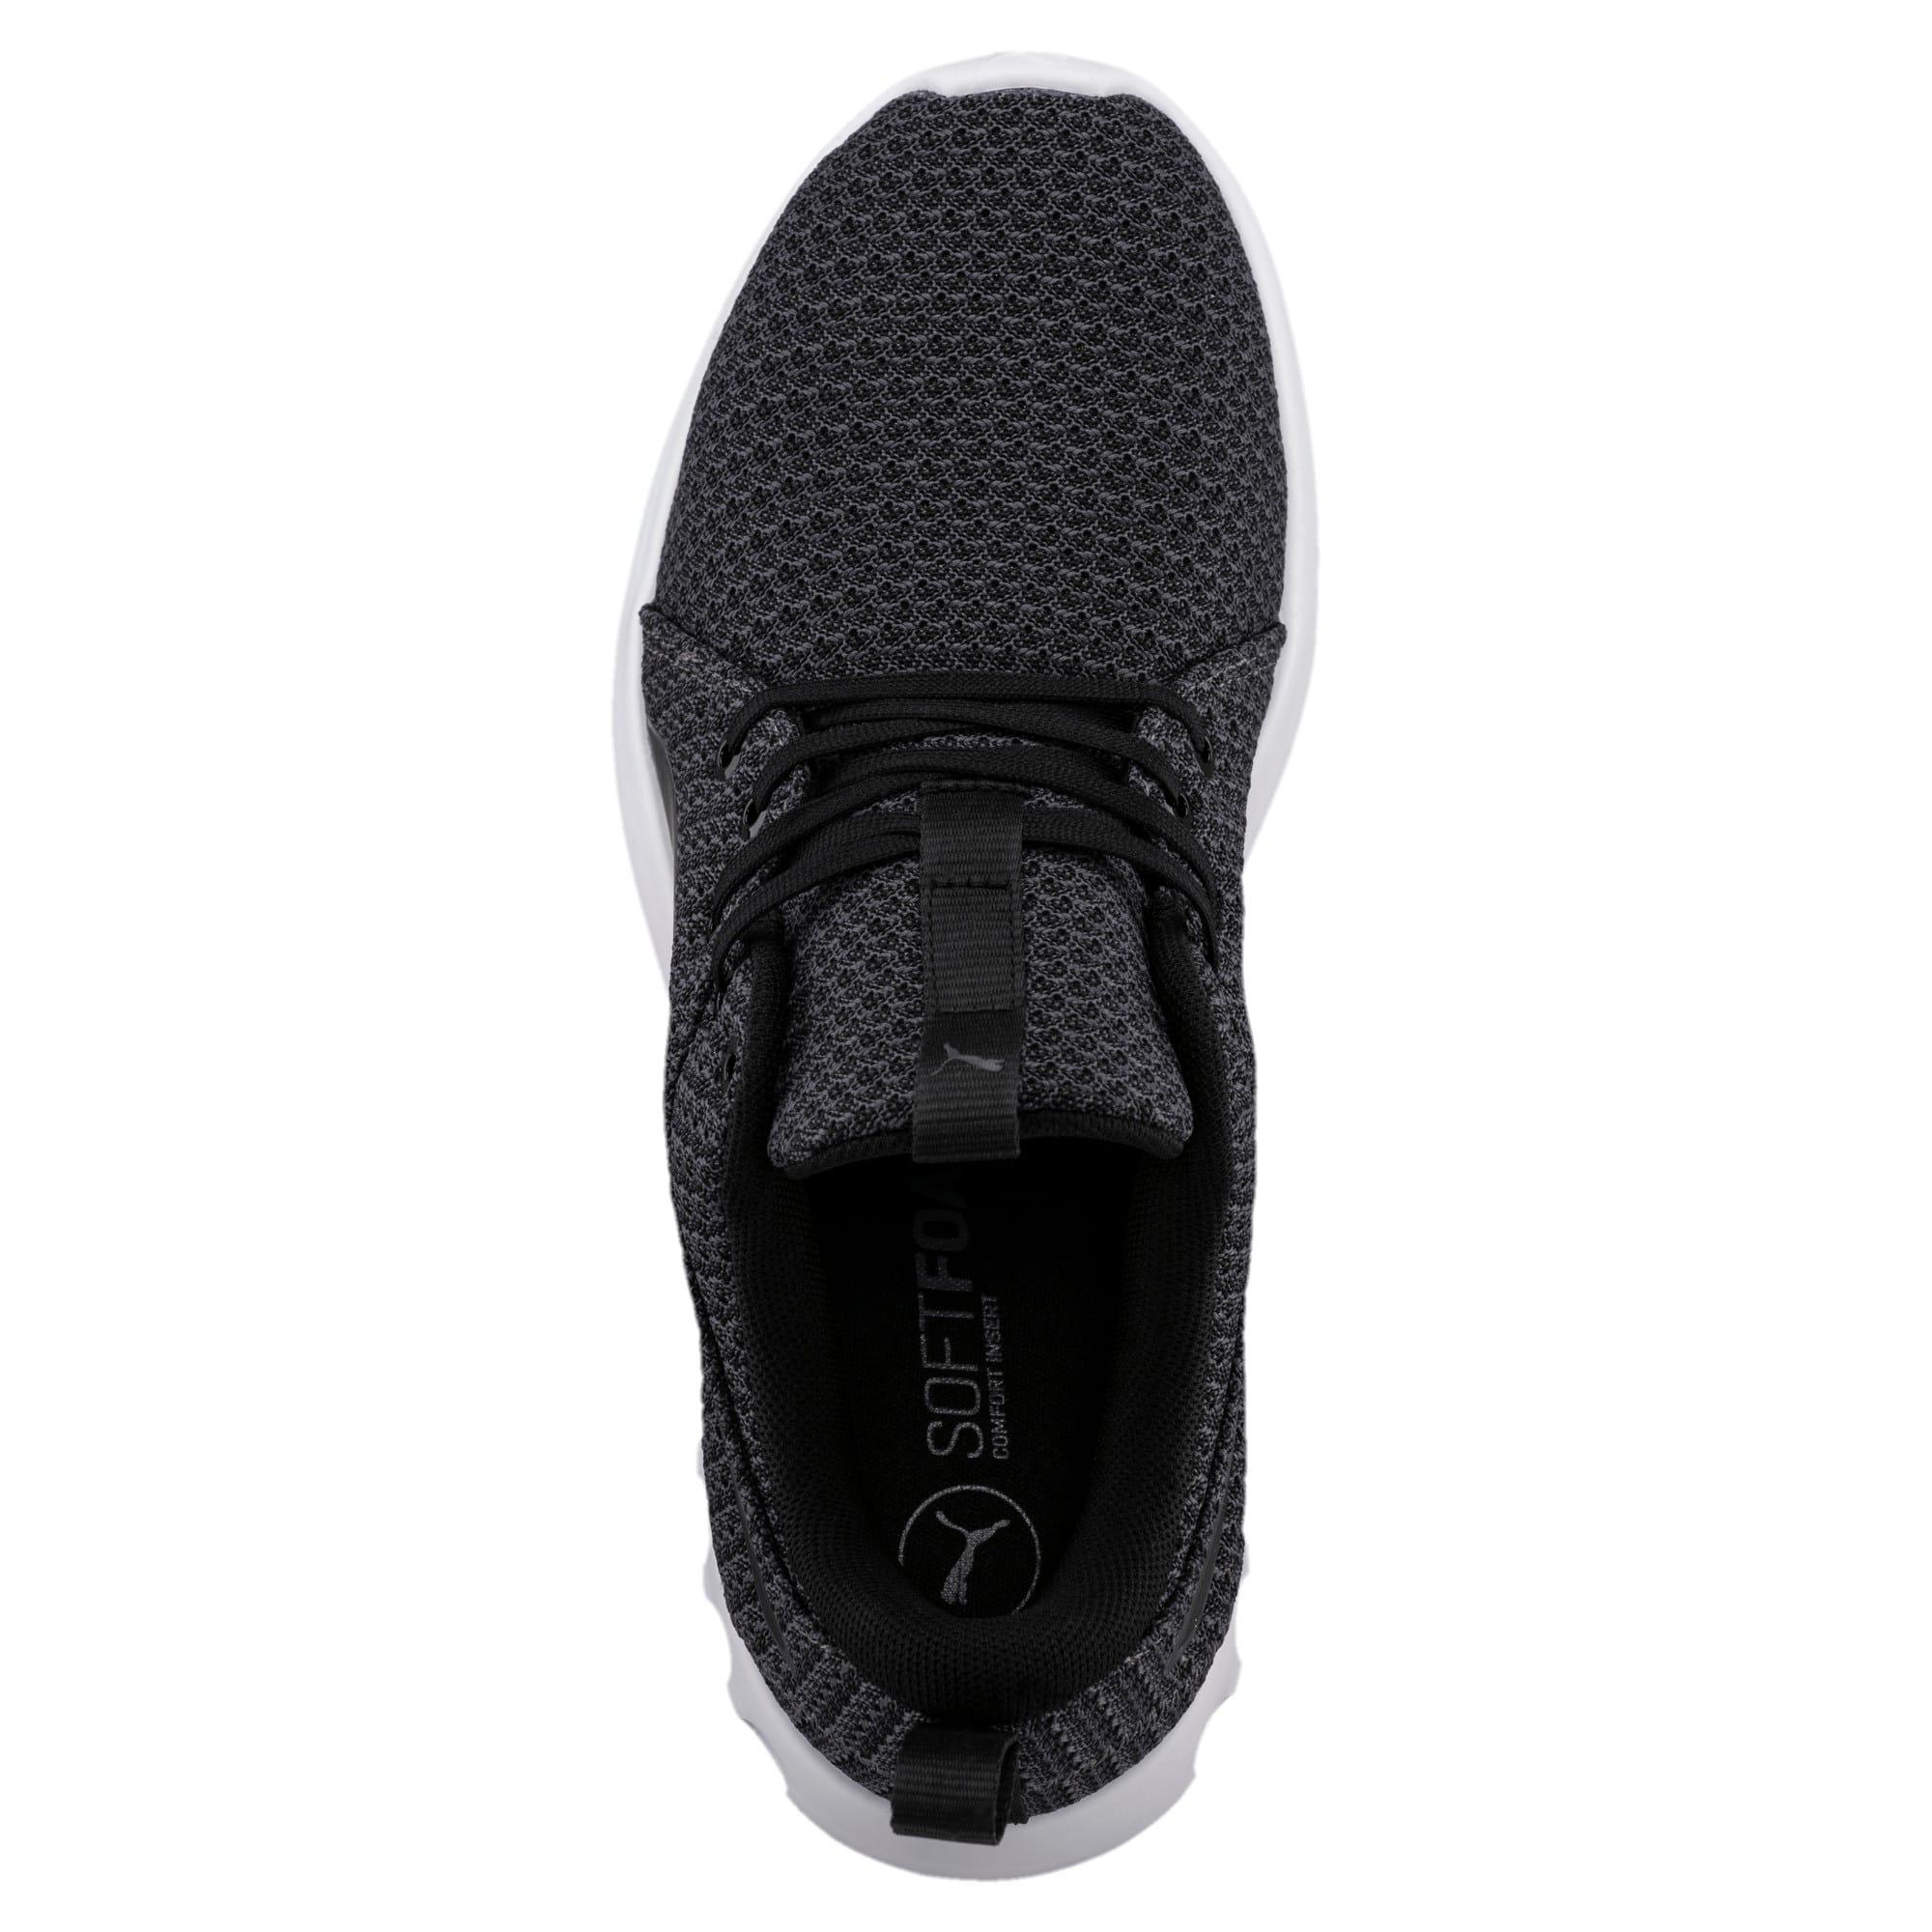 Thumbnail 5 of Carson 2 Knit Women's Running Shoes, Puma Black-Periscope, medium